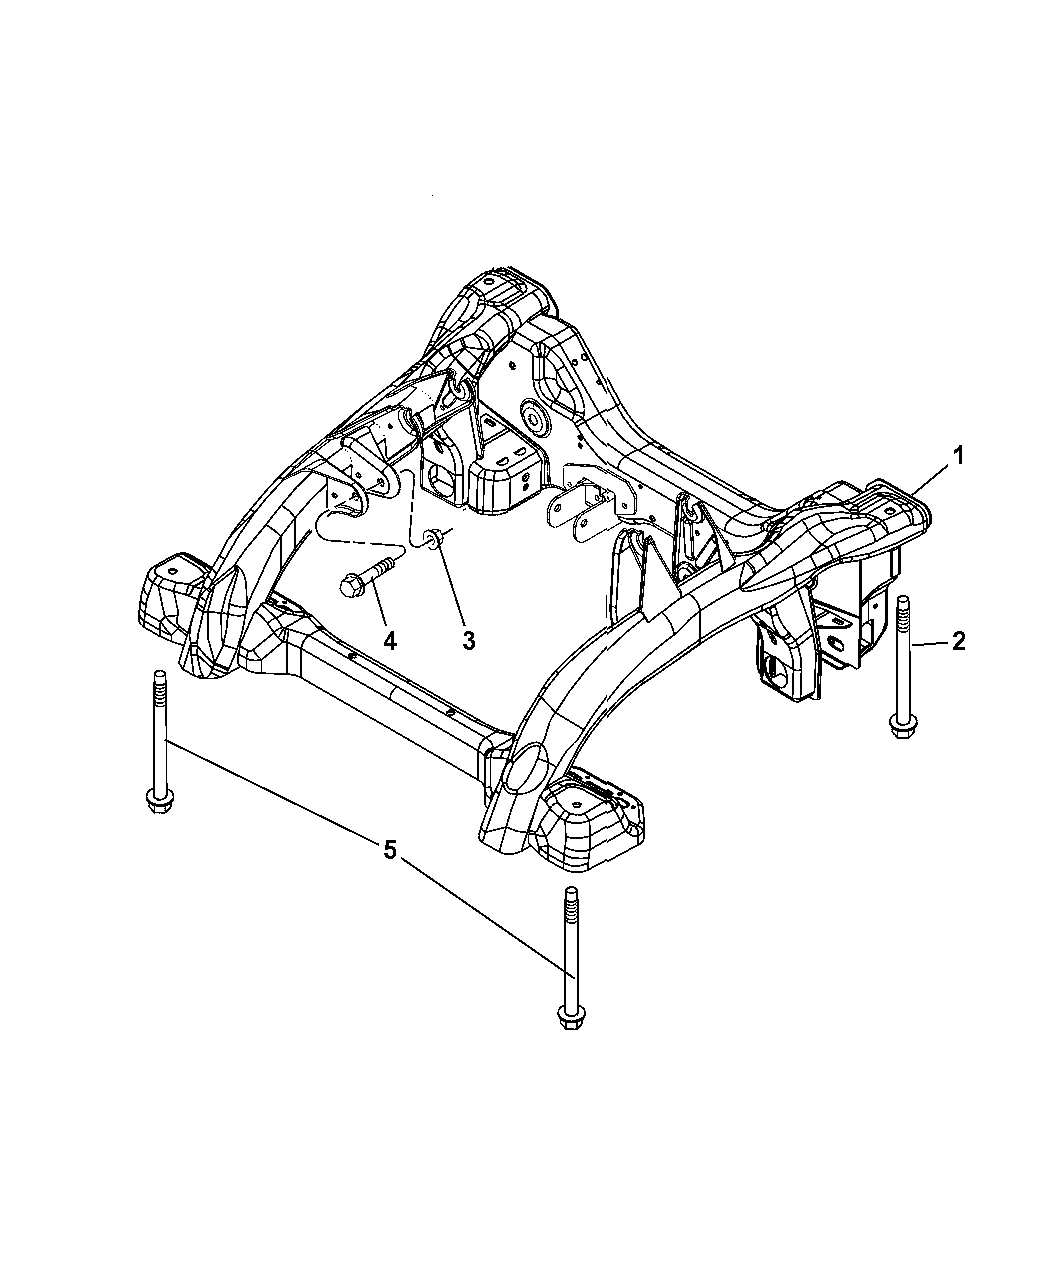 2006 Jeep Grand Cherokee Cradle, Front Suspension